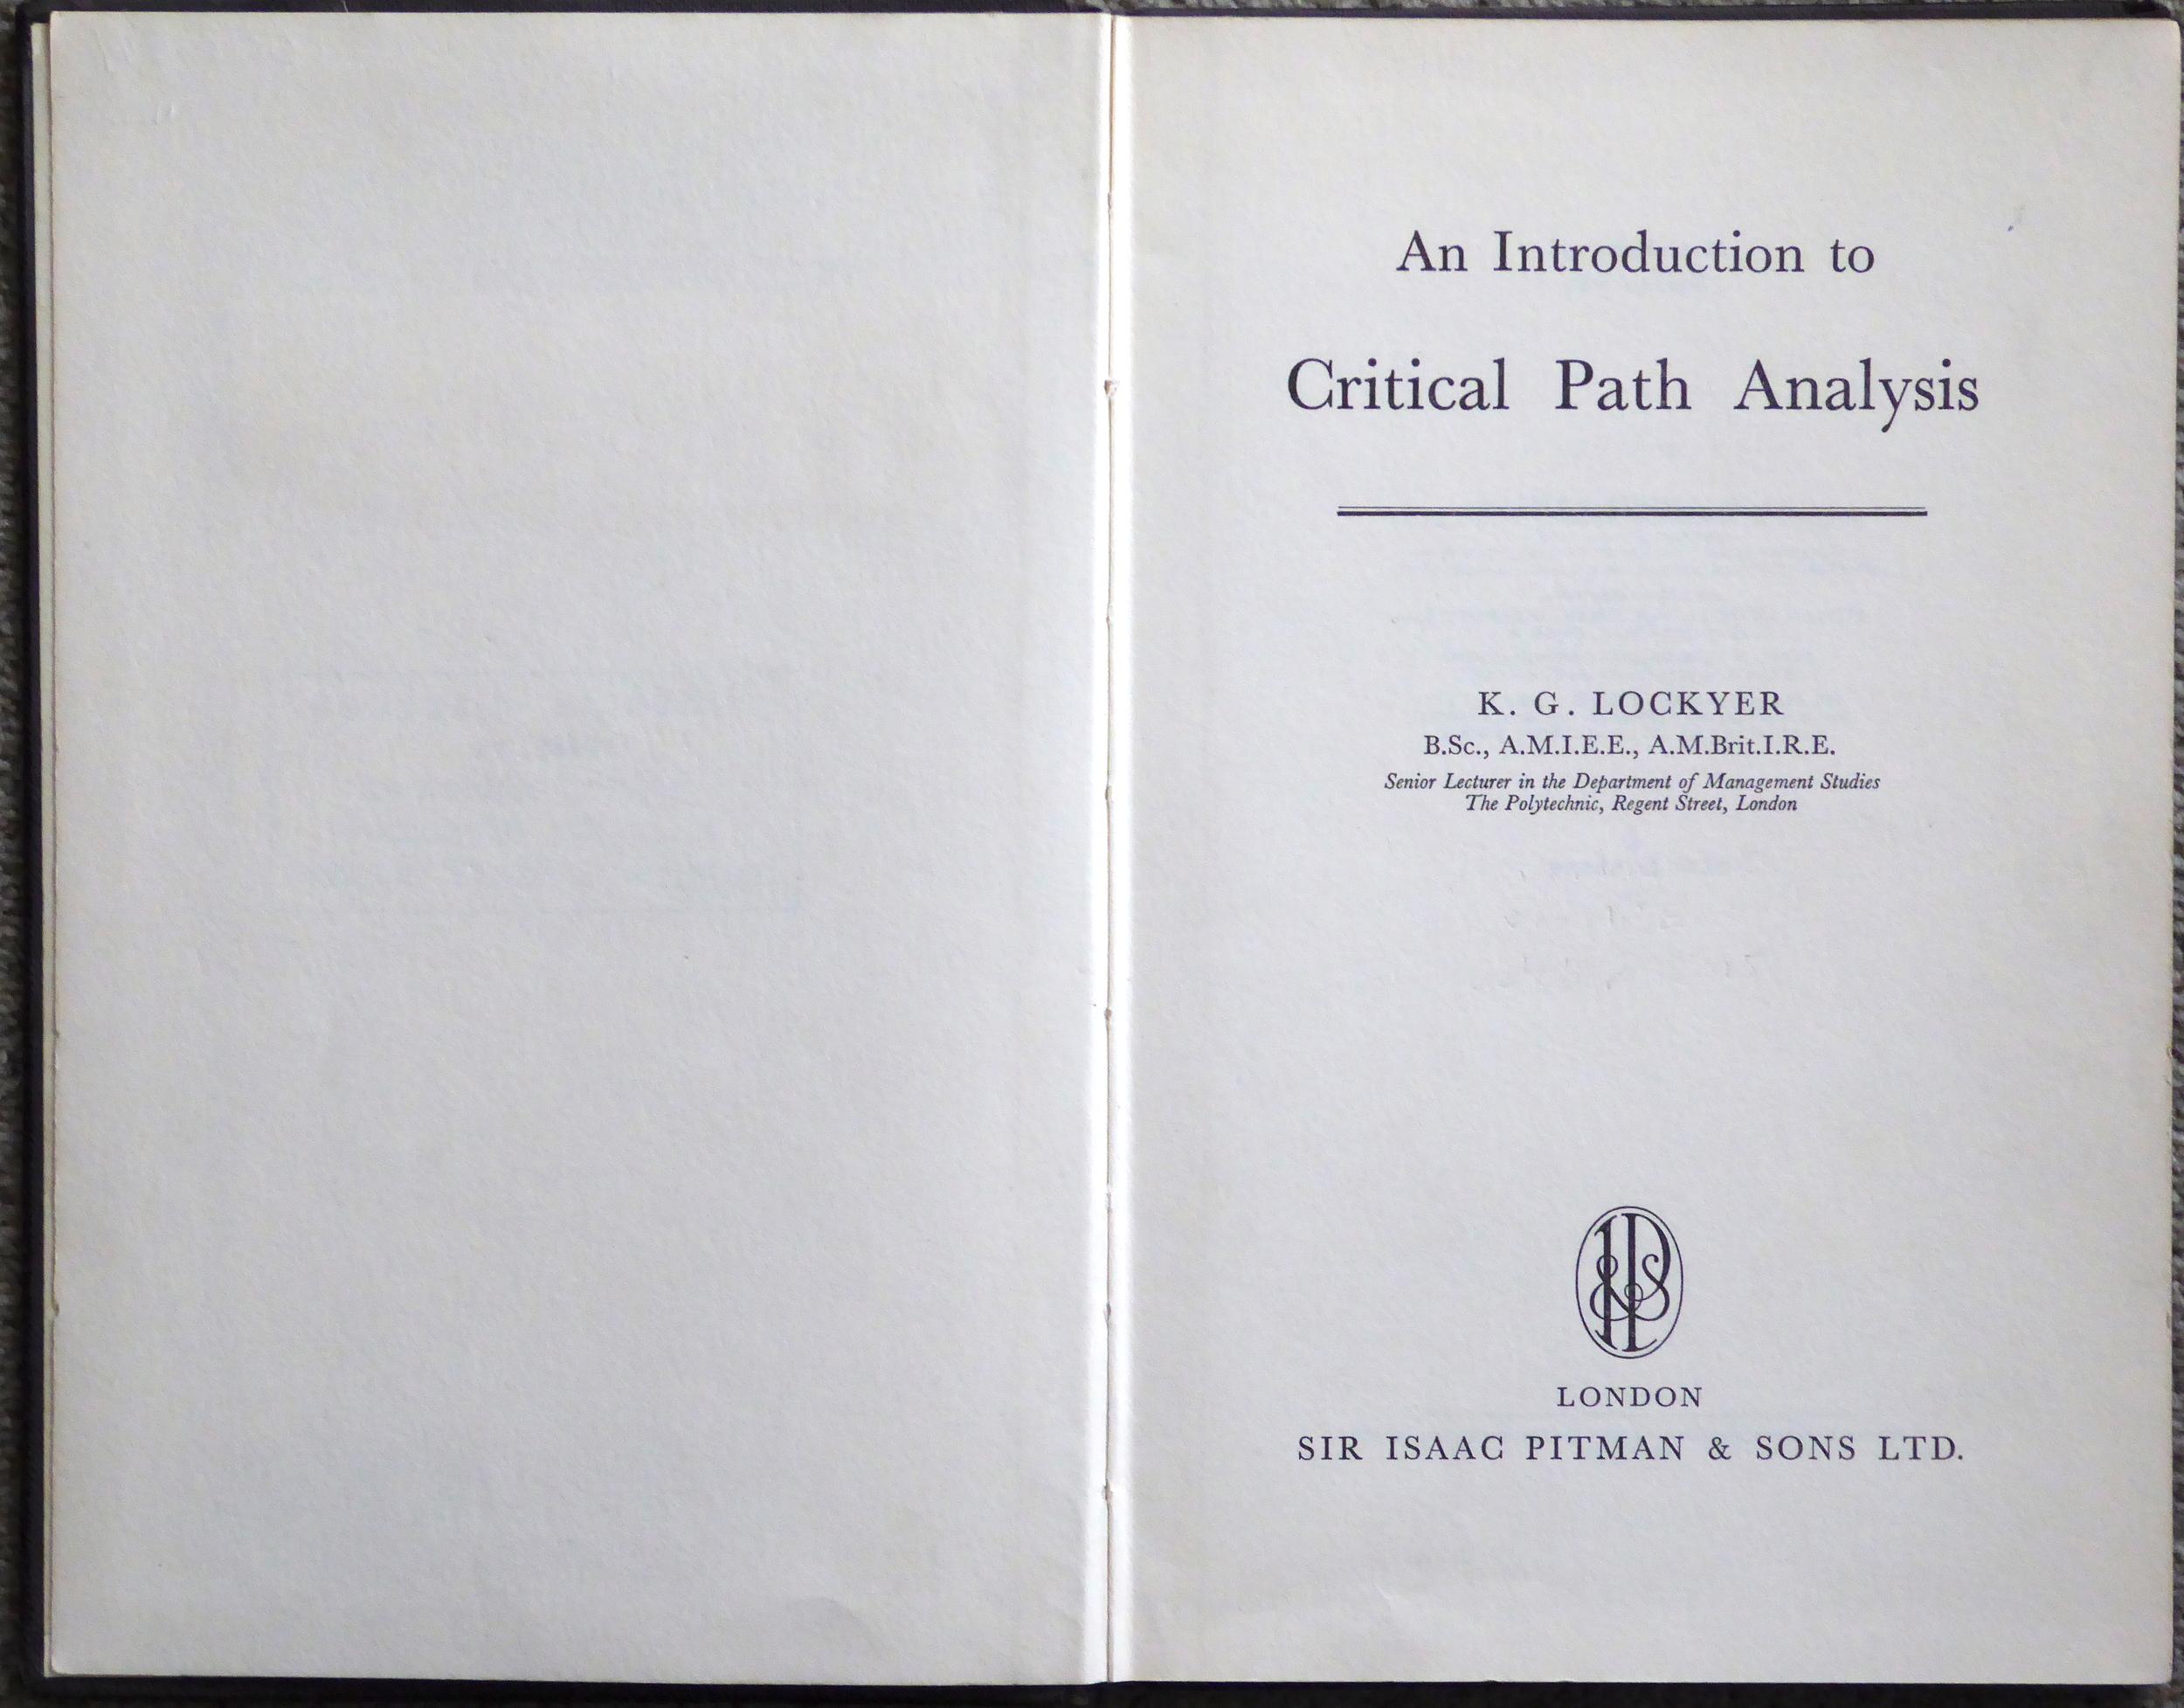 DDR_P1010059_Lockyer_IntroCriticalPathAnalysis.JPG